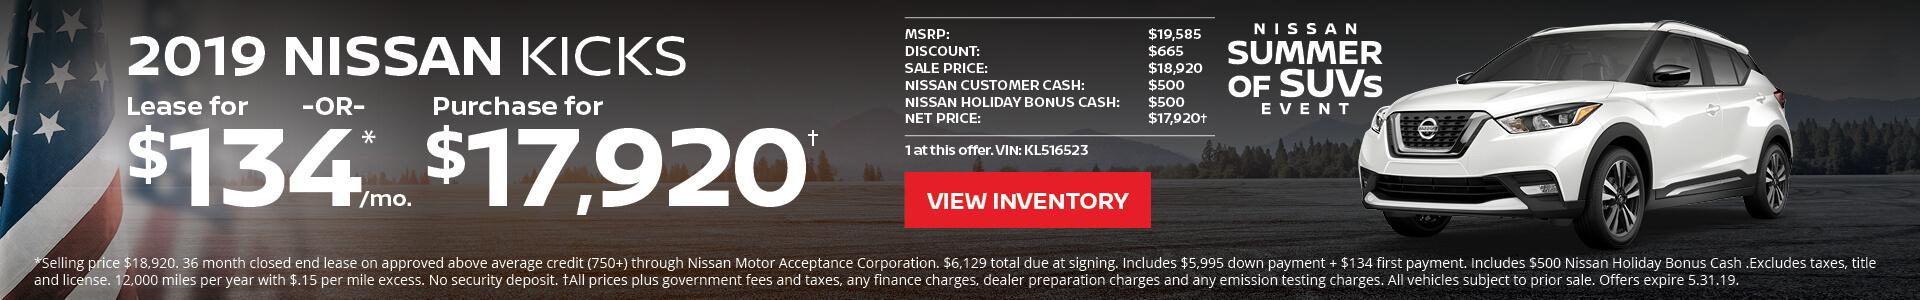 Nissan Kicks $134 Lease